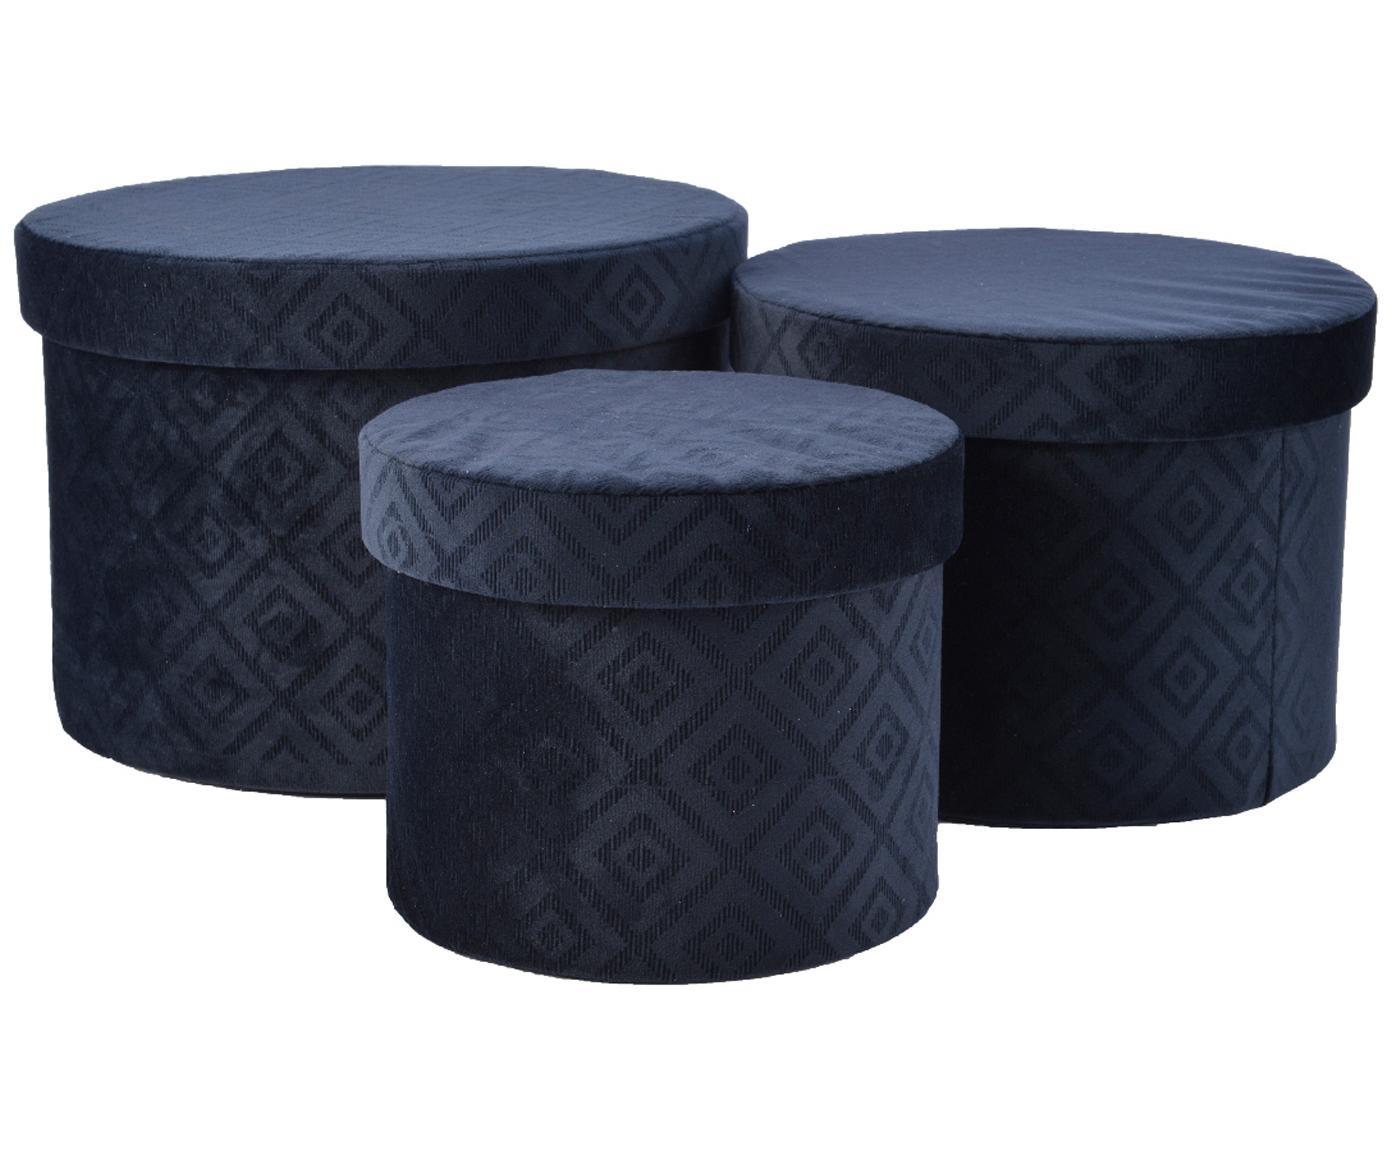 Set de cajas de regalo de terciopelo Trinity Caro, 3pzas., Terciopelo de poliéster, Azul oscuro, Tamaños diferentes